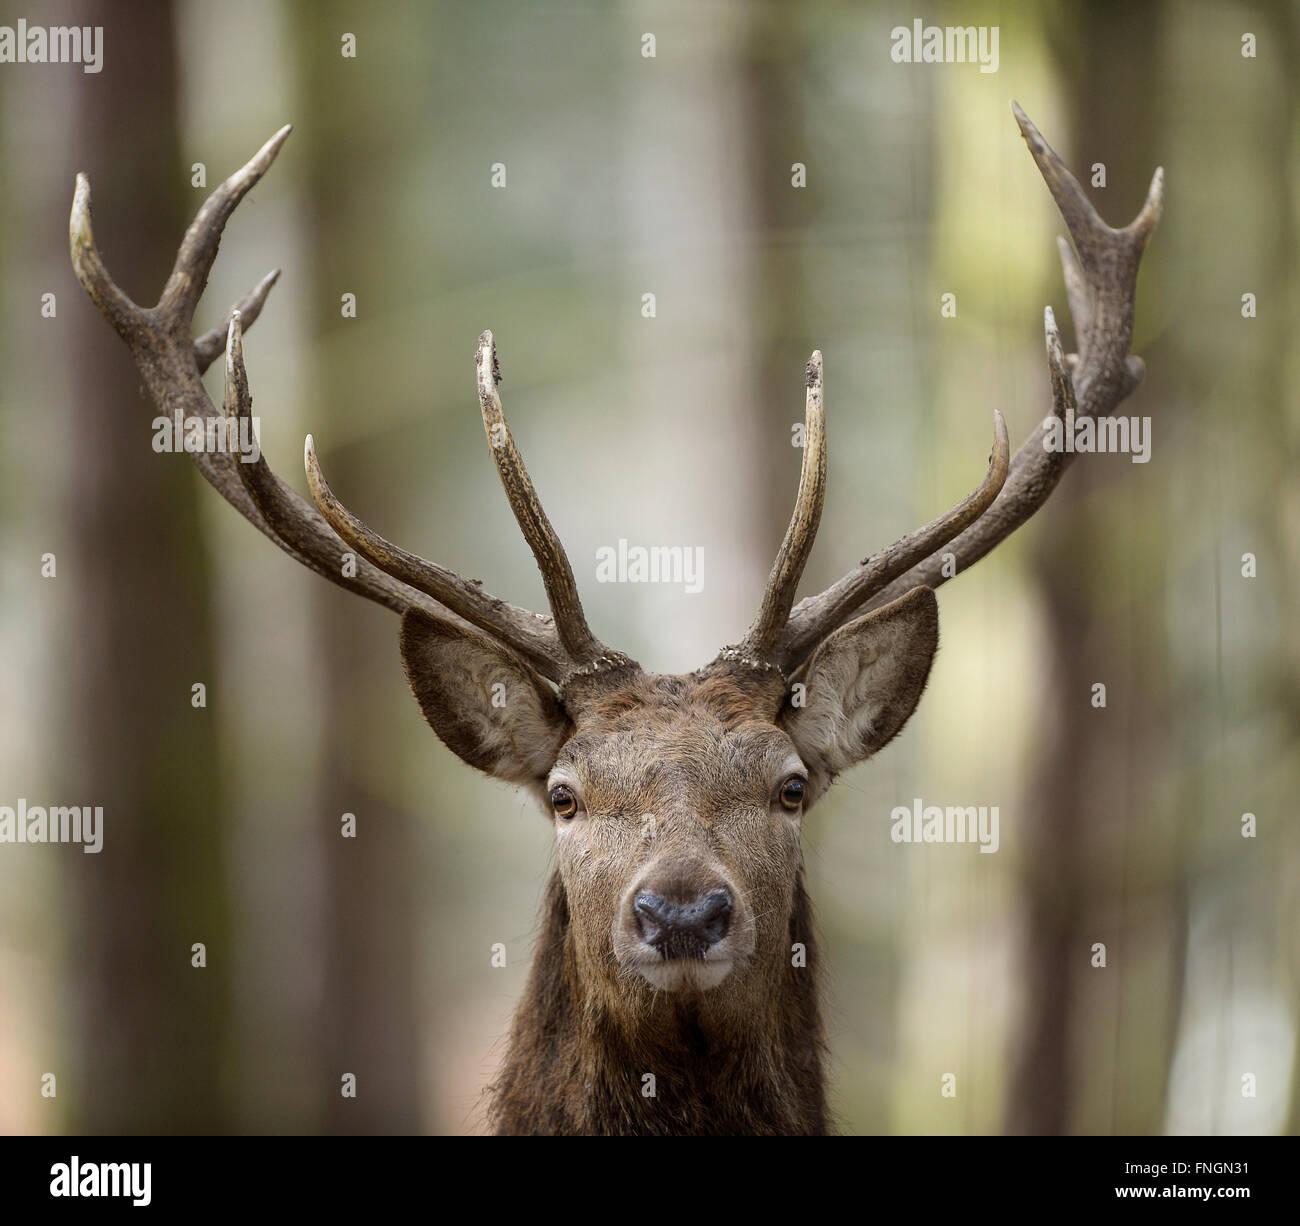 Red Deer Stag, Wildwood, Kent - Stock Image